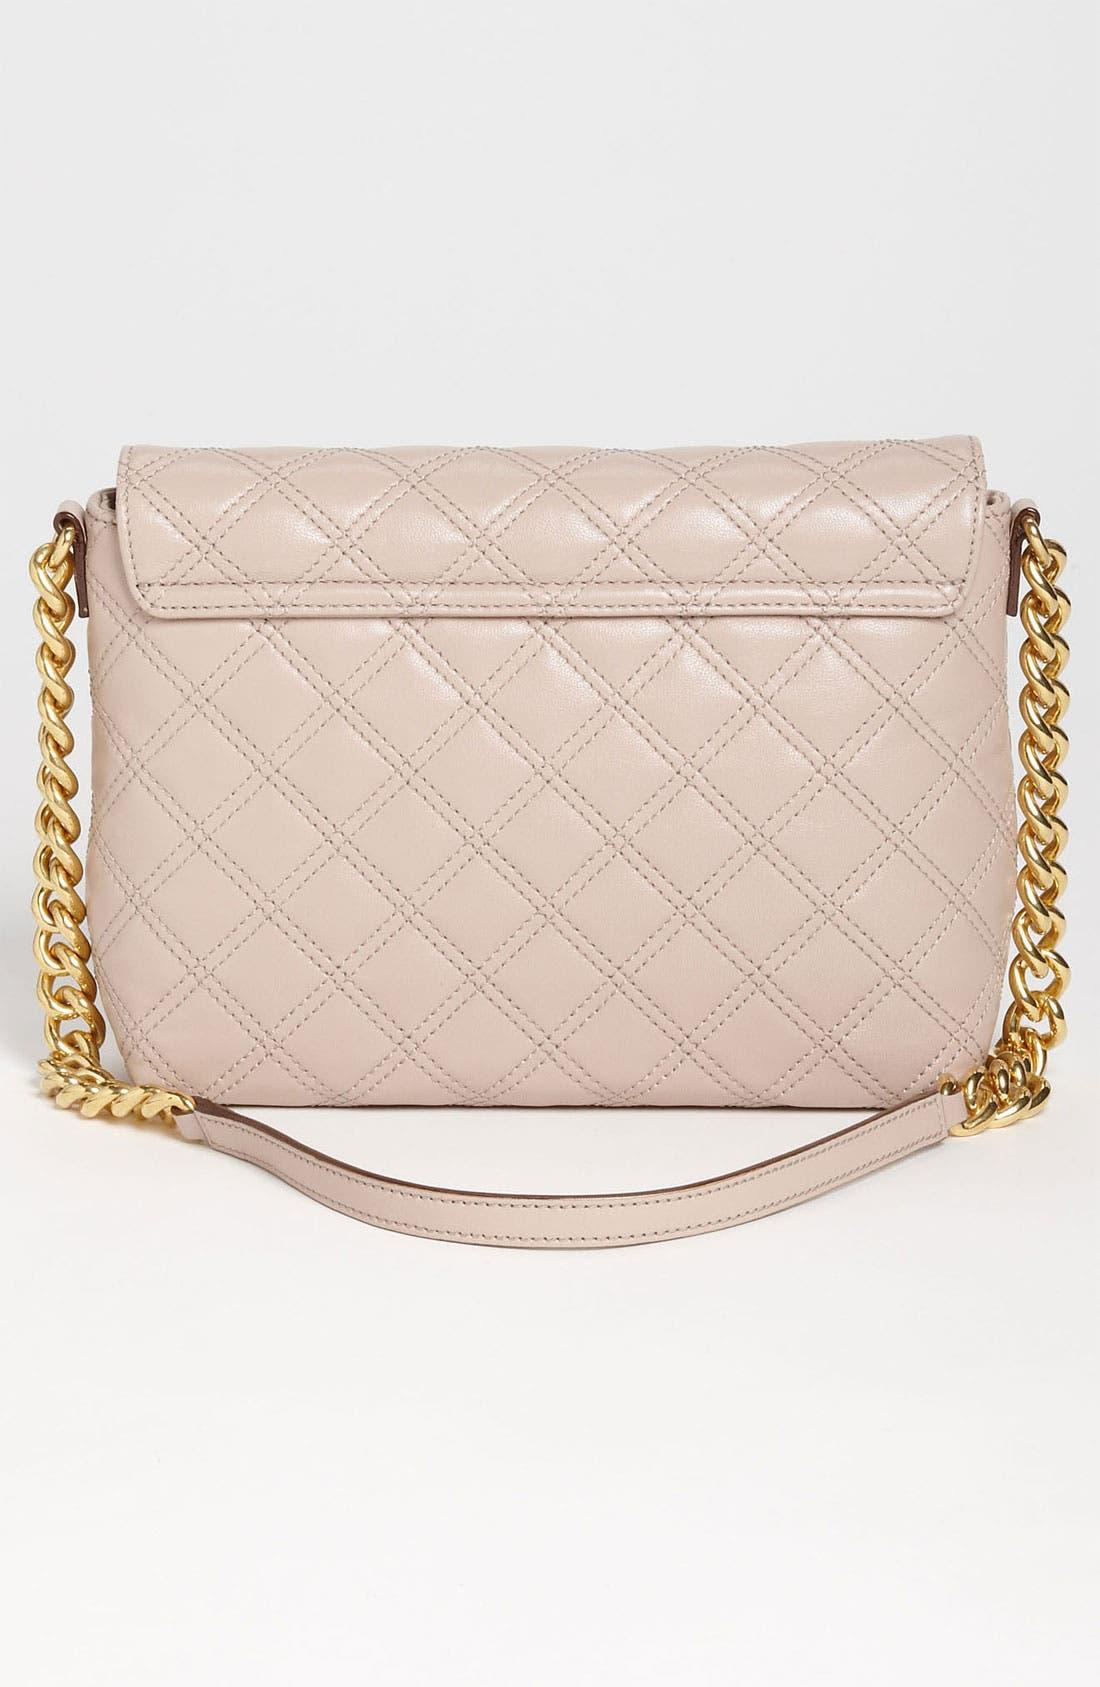 ,                             'Large Quilting Single' Leather Shoulder Bag,                             Alternate thumbnail 25, color,                             250